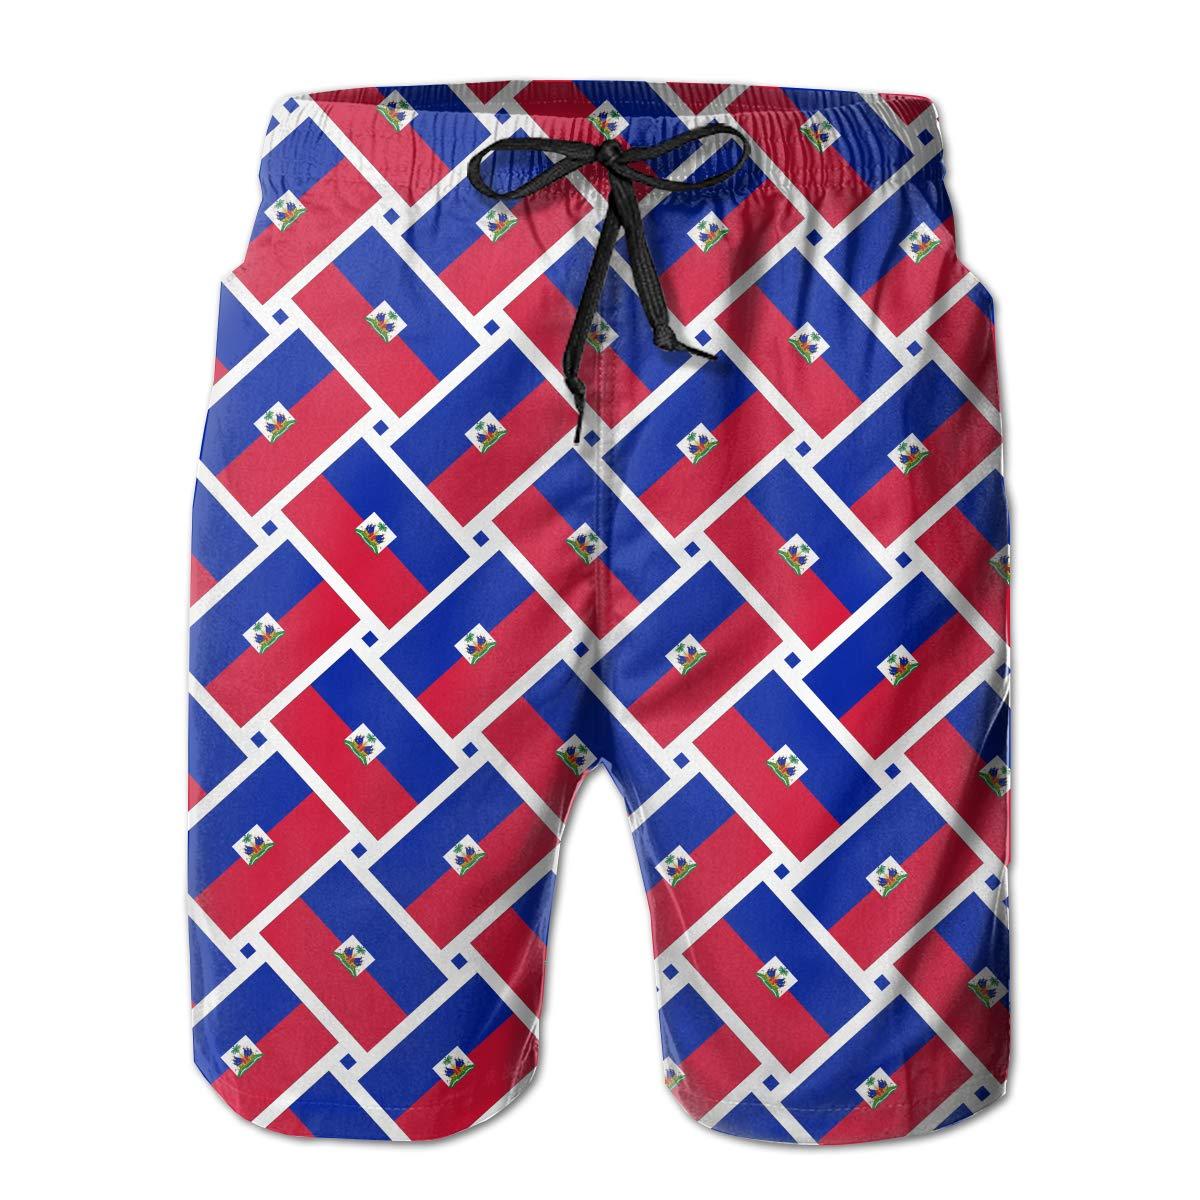 Mens Swim Trunks Haiti Flag Weave Quick Dry Beach Board Shorts with Mesh Lining